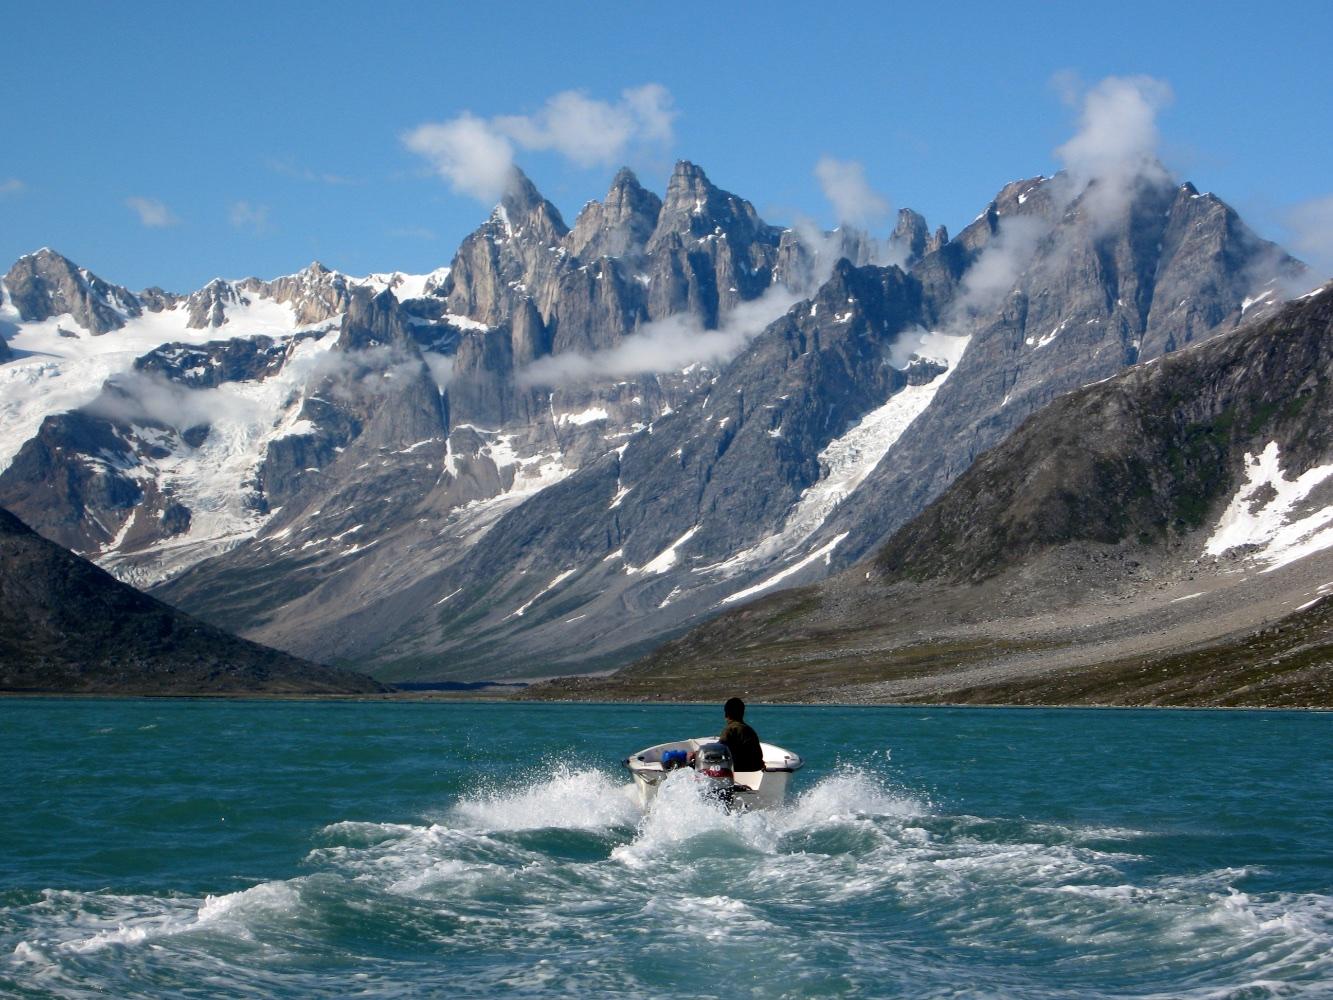 A couple of fisherman took us from Kuummiiut to the head of the Tasiilaq Fjord